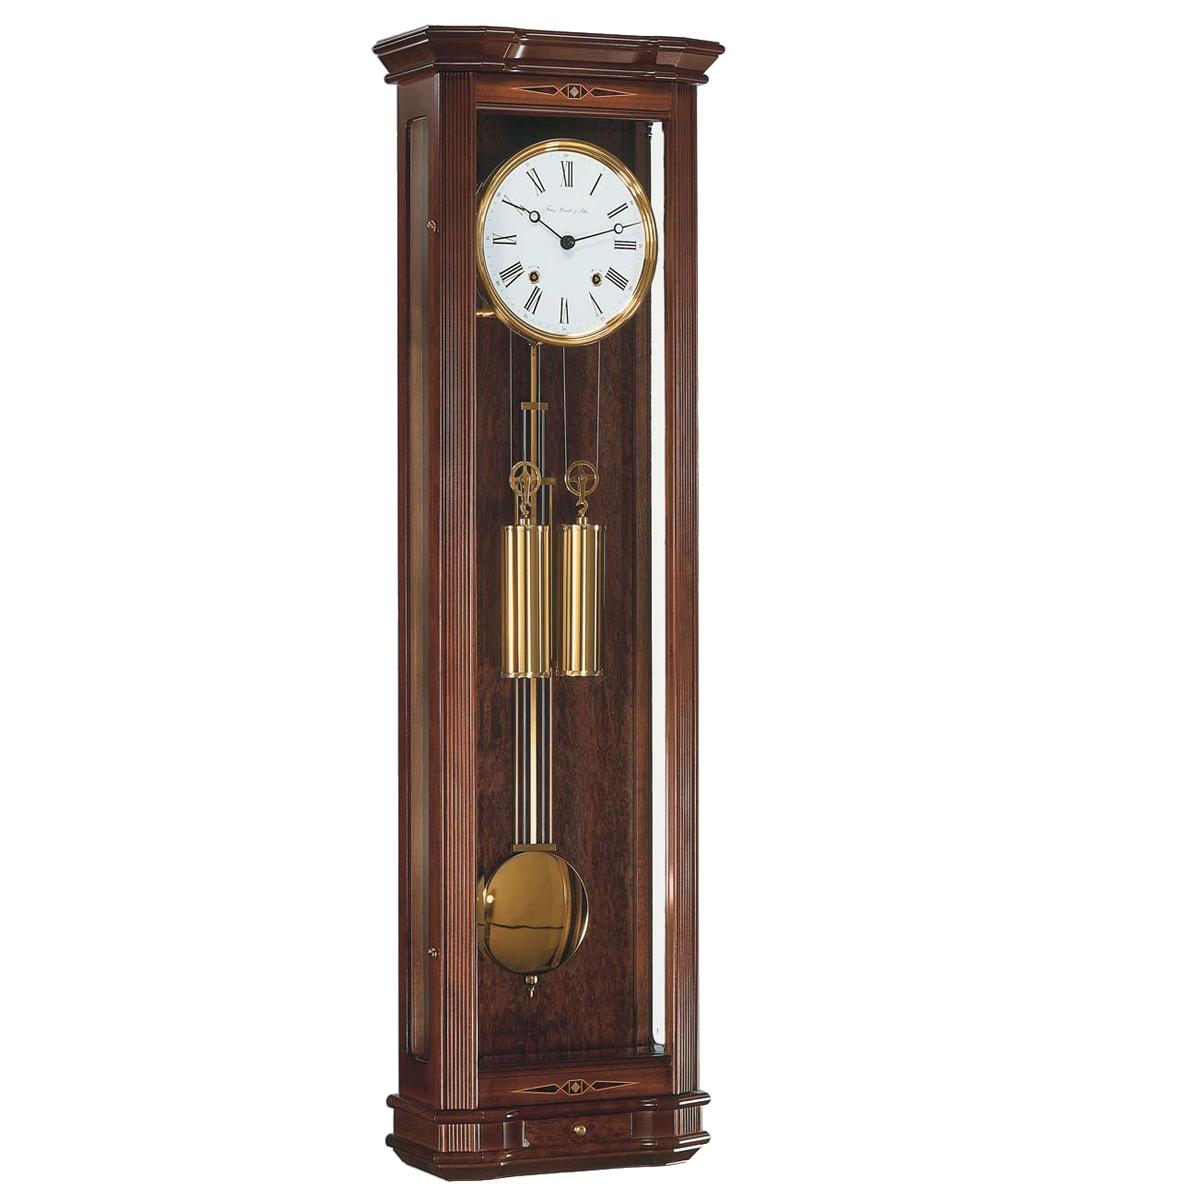 Hermle CLAPHAM 70617-030058-Regulator Wall Clock